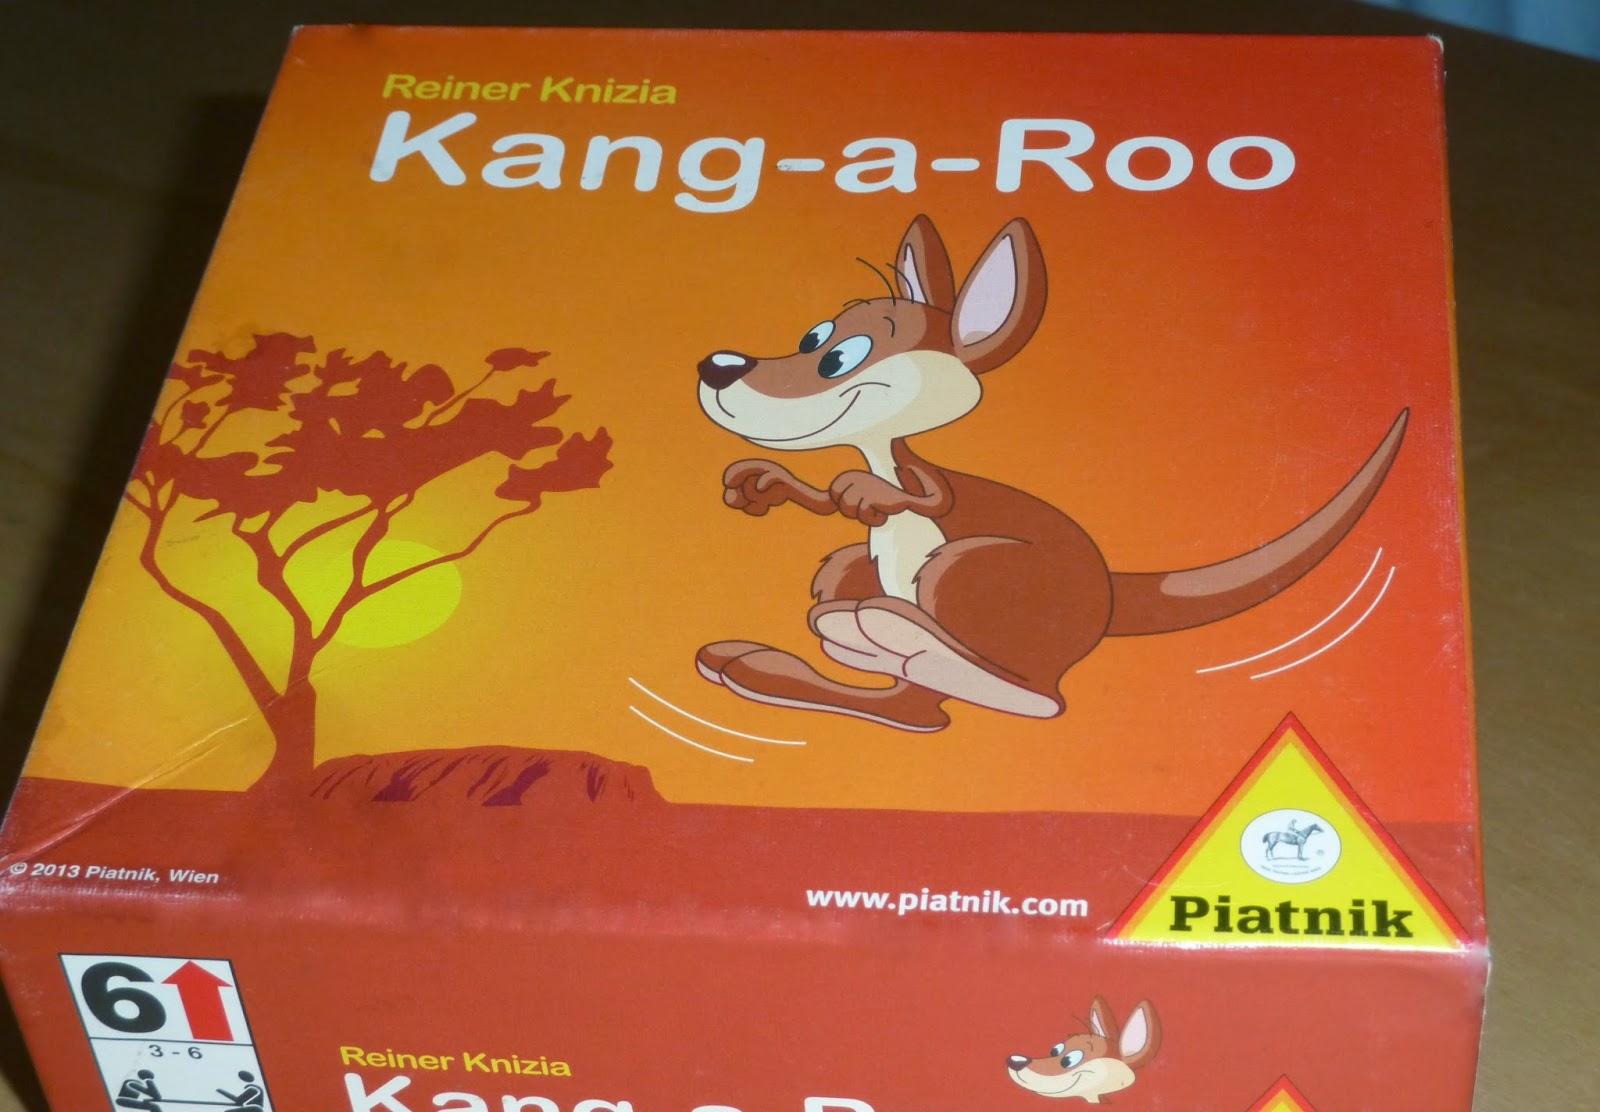 Kang-a-Roo wydawnictwo Piatnik